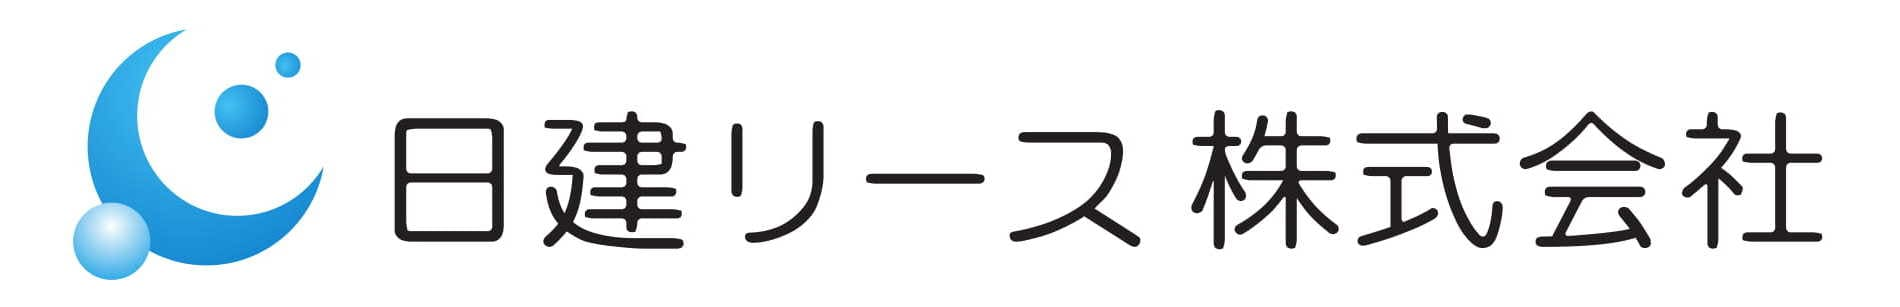 日建リース株式会社